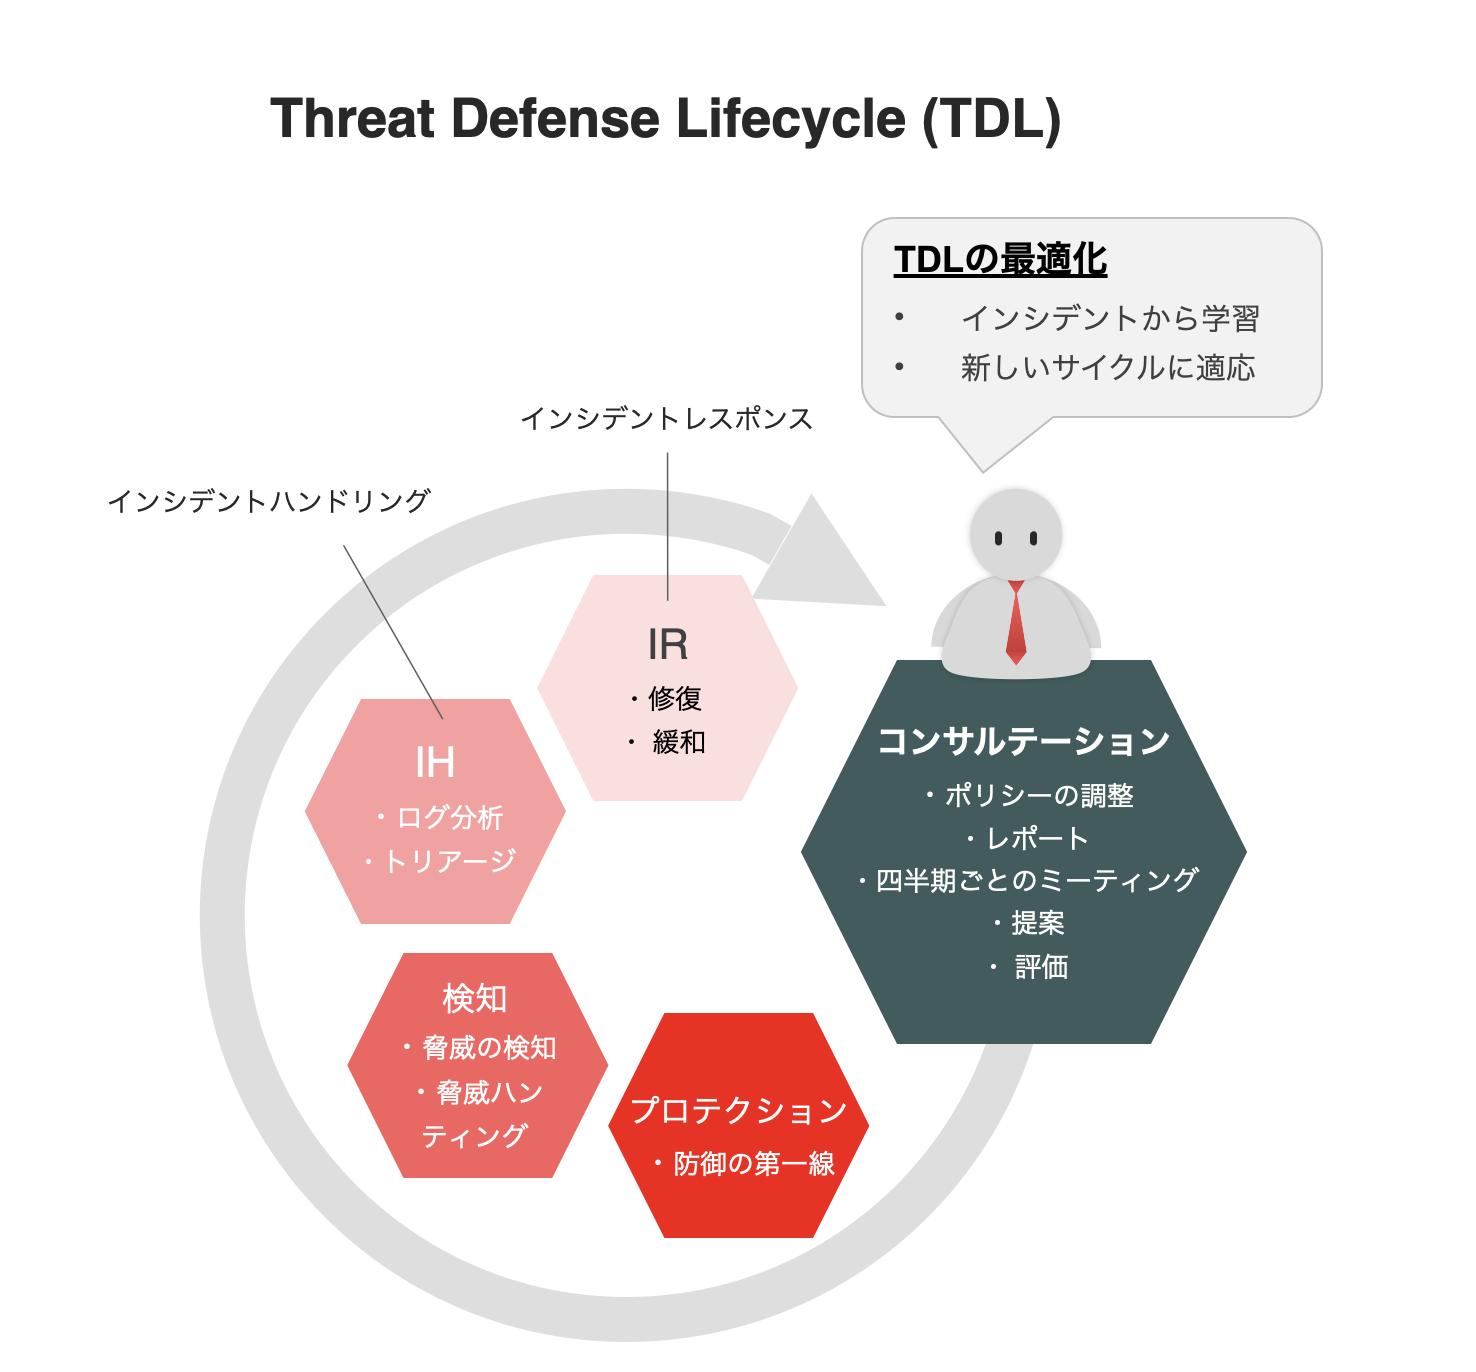 Threat Defense Lifecycle